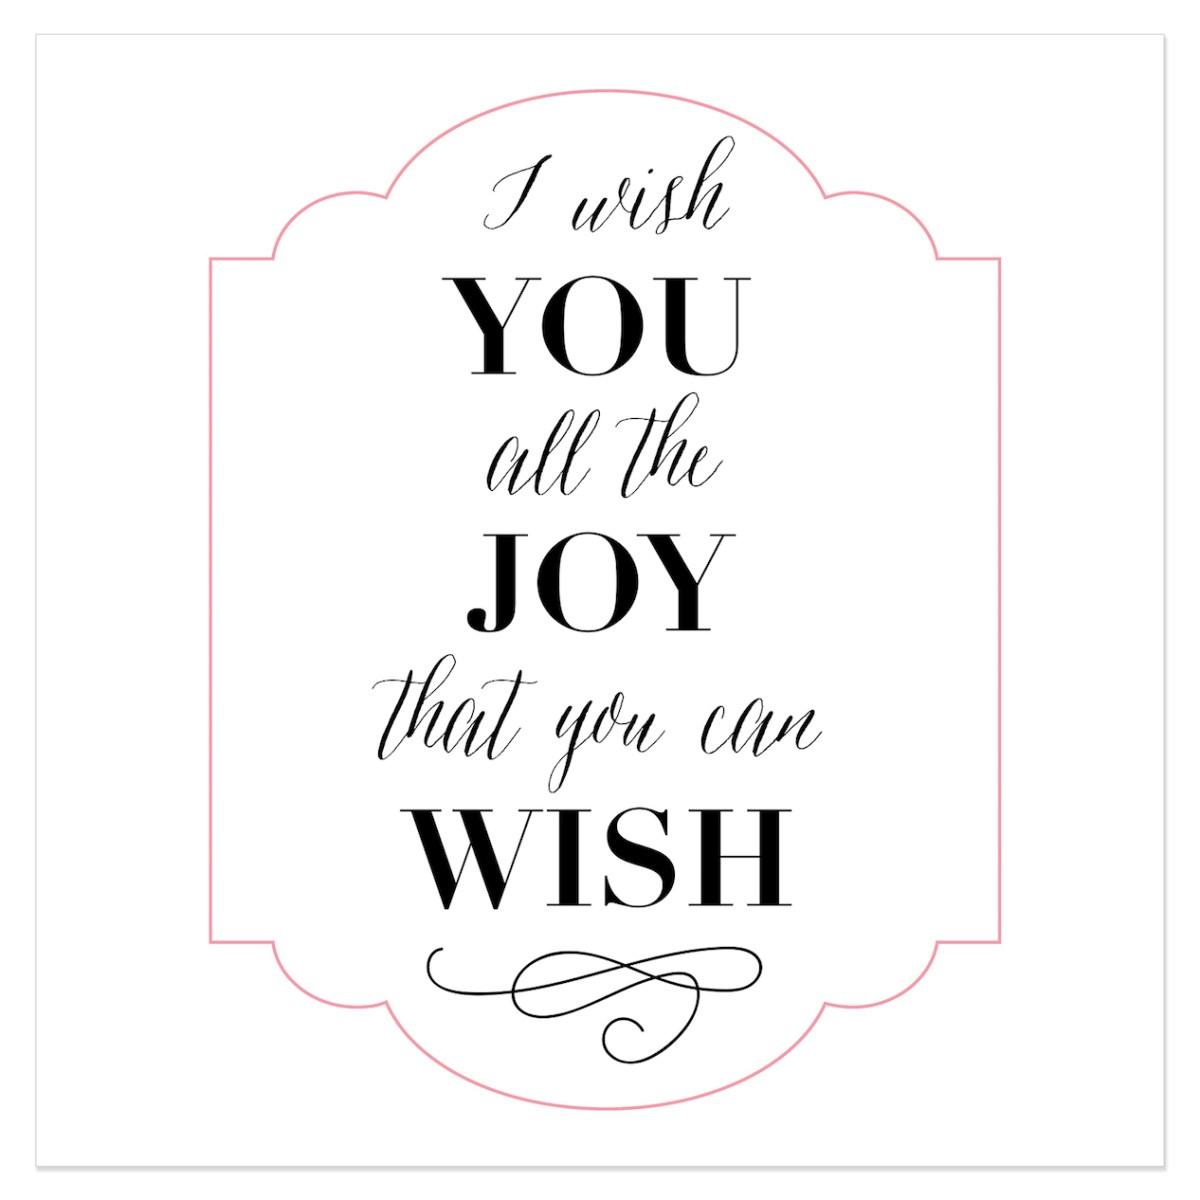 Here's to You #ctmh #closetomyheart #here'stoyou #wishyoujoy #Iwishyouallthejoythatyoucanwish #wishyoujoystampset #campaign #constantcampaign #ctmhhere'stoyou #exclusivestampset #sale #monthlyspecial